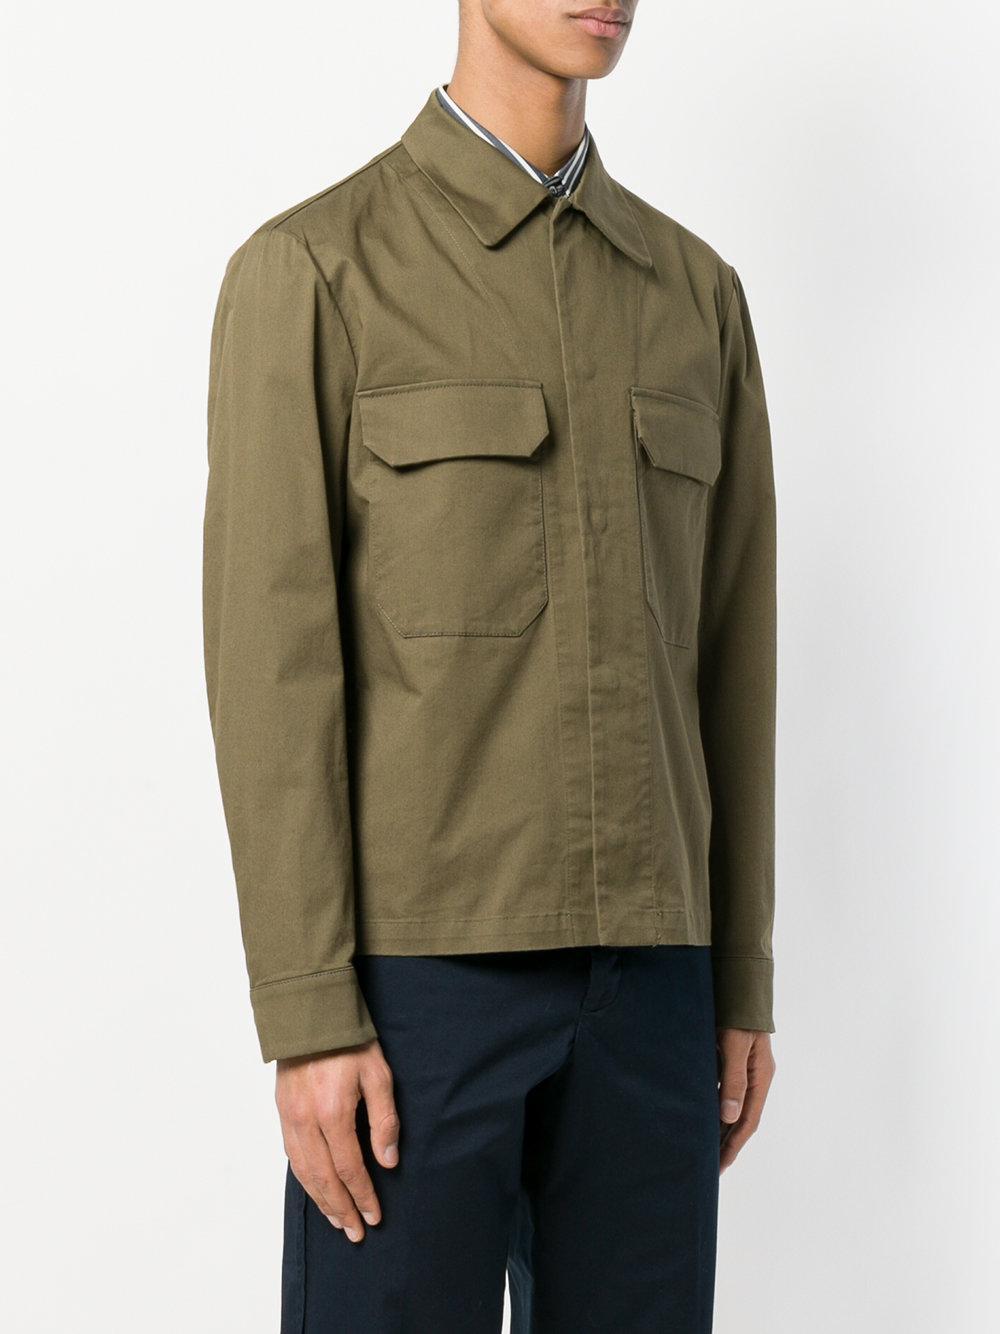 Barena Cotton Button Shirt Jacket in Green for Men